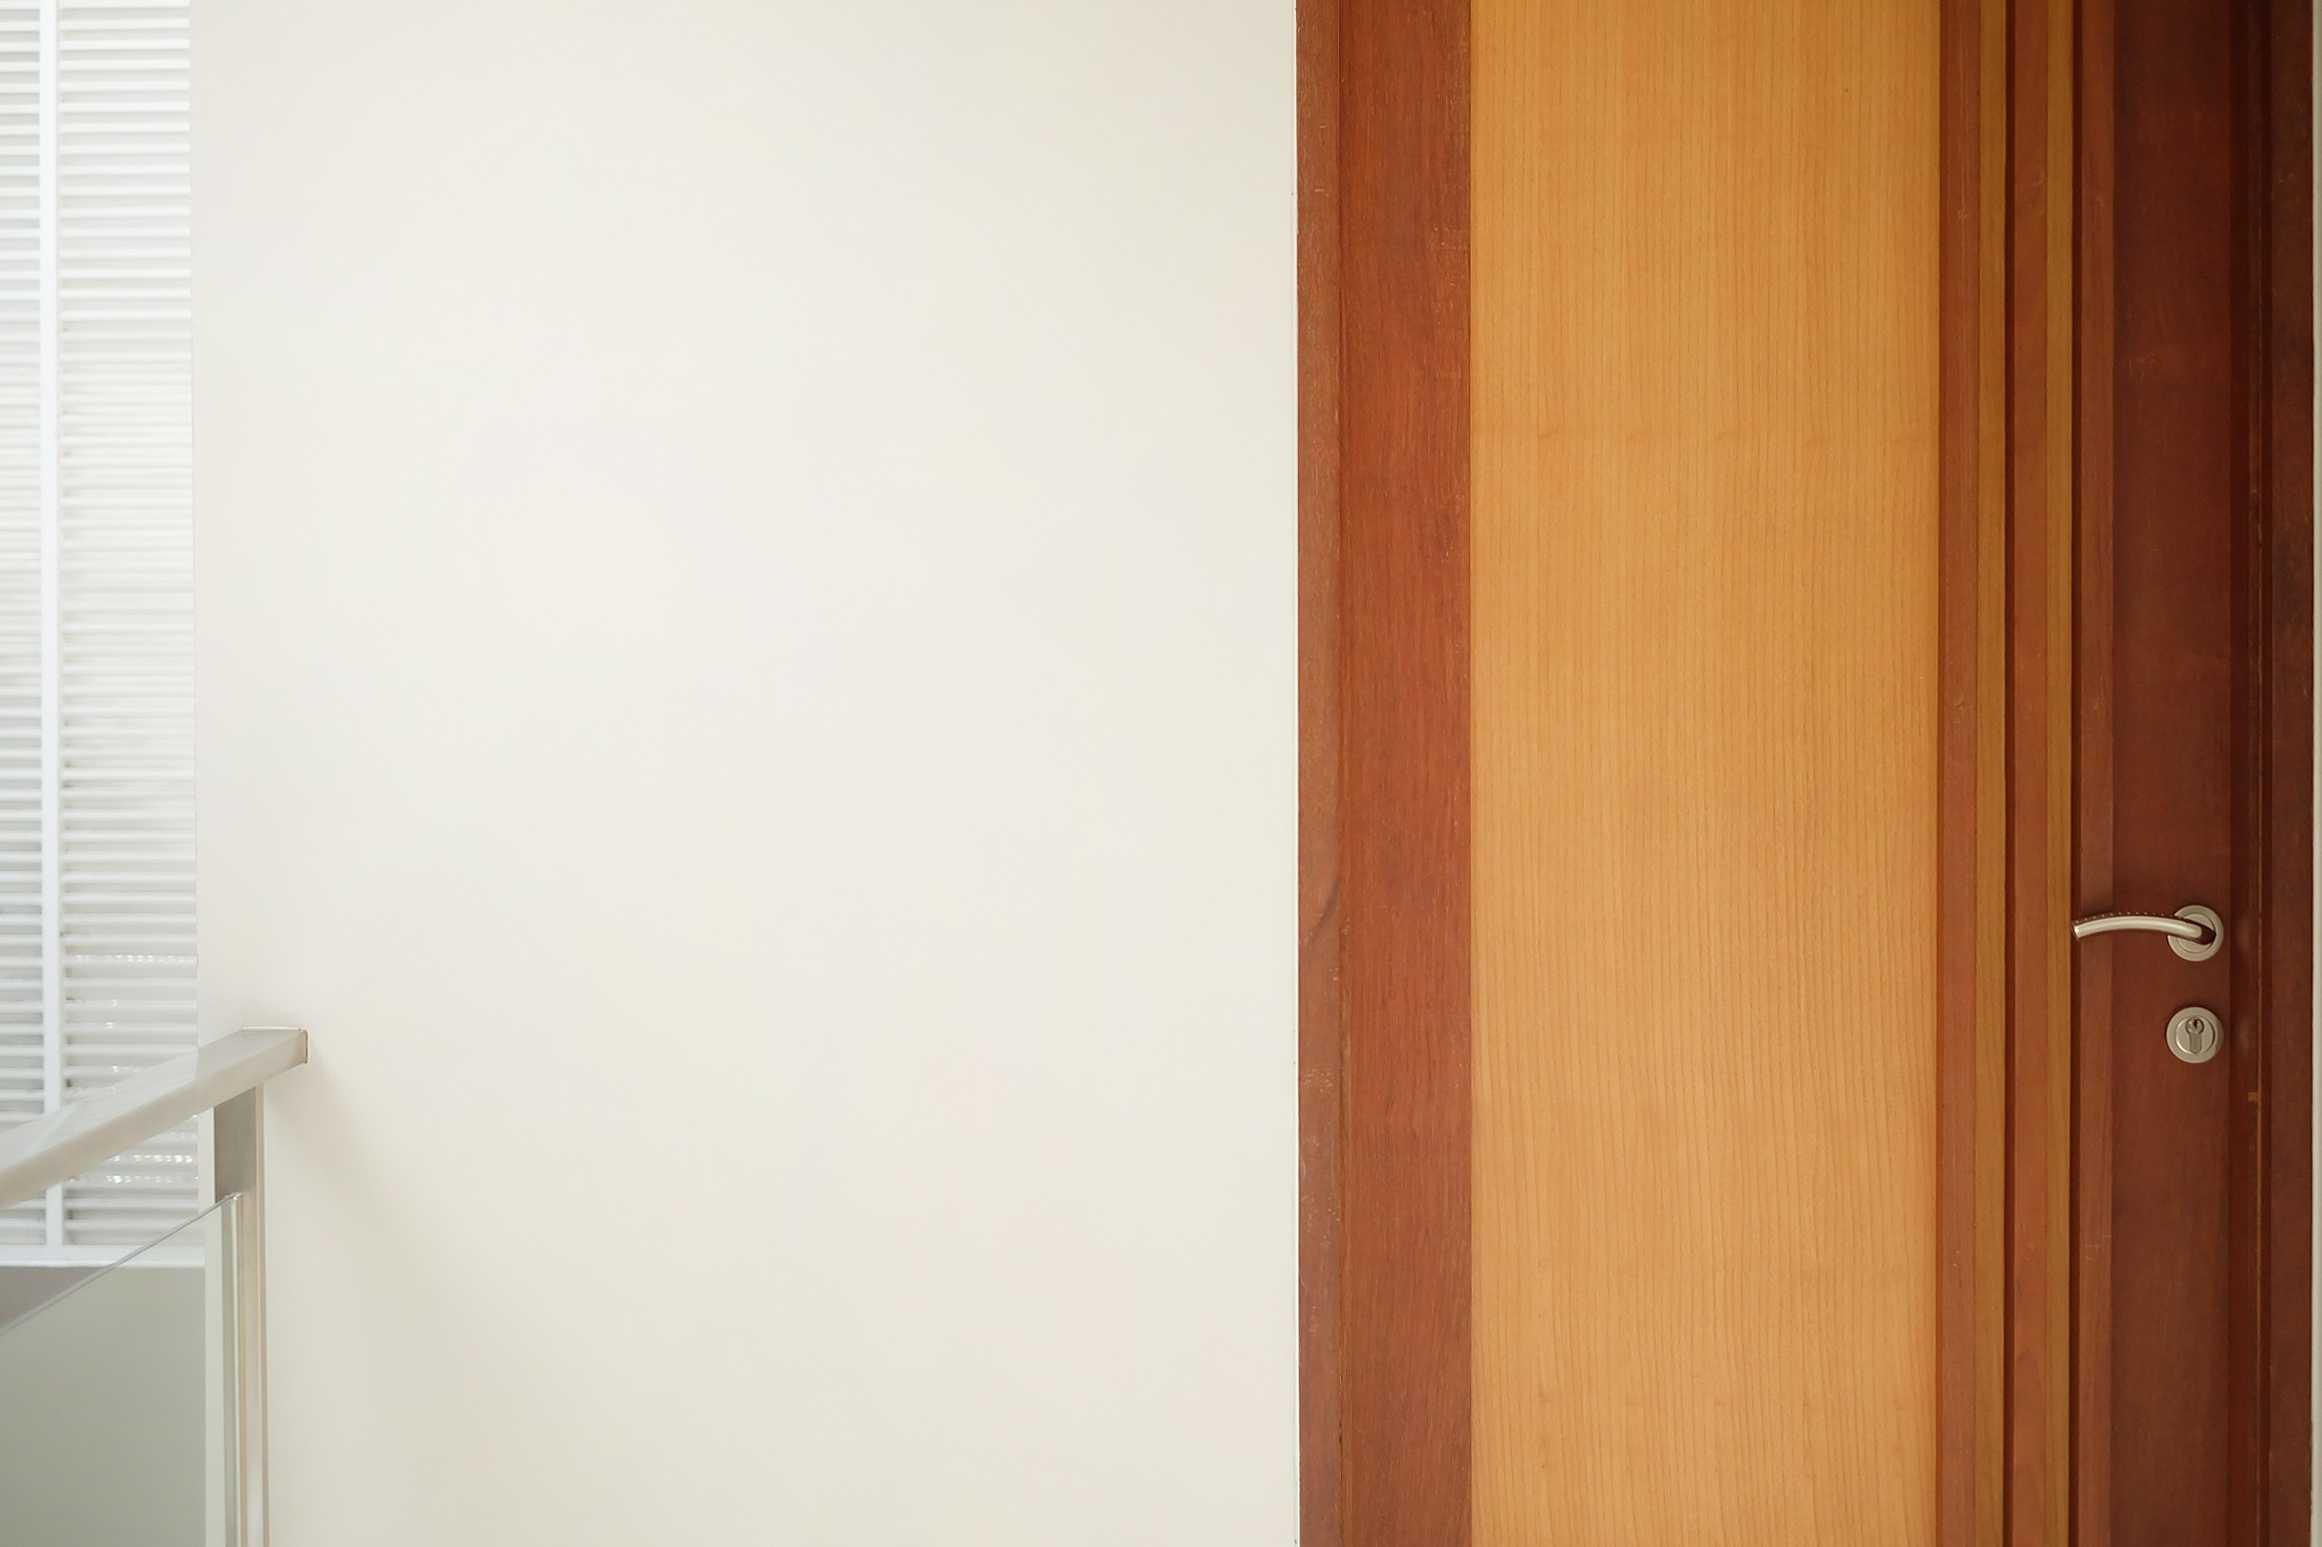 Dica Selaras Di House Jl. Maleber Utara No.125, Campaka, Andir, Kota Bandung, Jawa Barat 40184, Indonesia Jl. Maleber Utara No.125, Campaka, Andir, Kota Bandung, Jawa Barat 40184, Indonesia Dica-Selaras-Di-House   52350